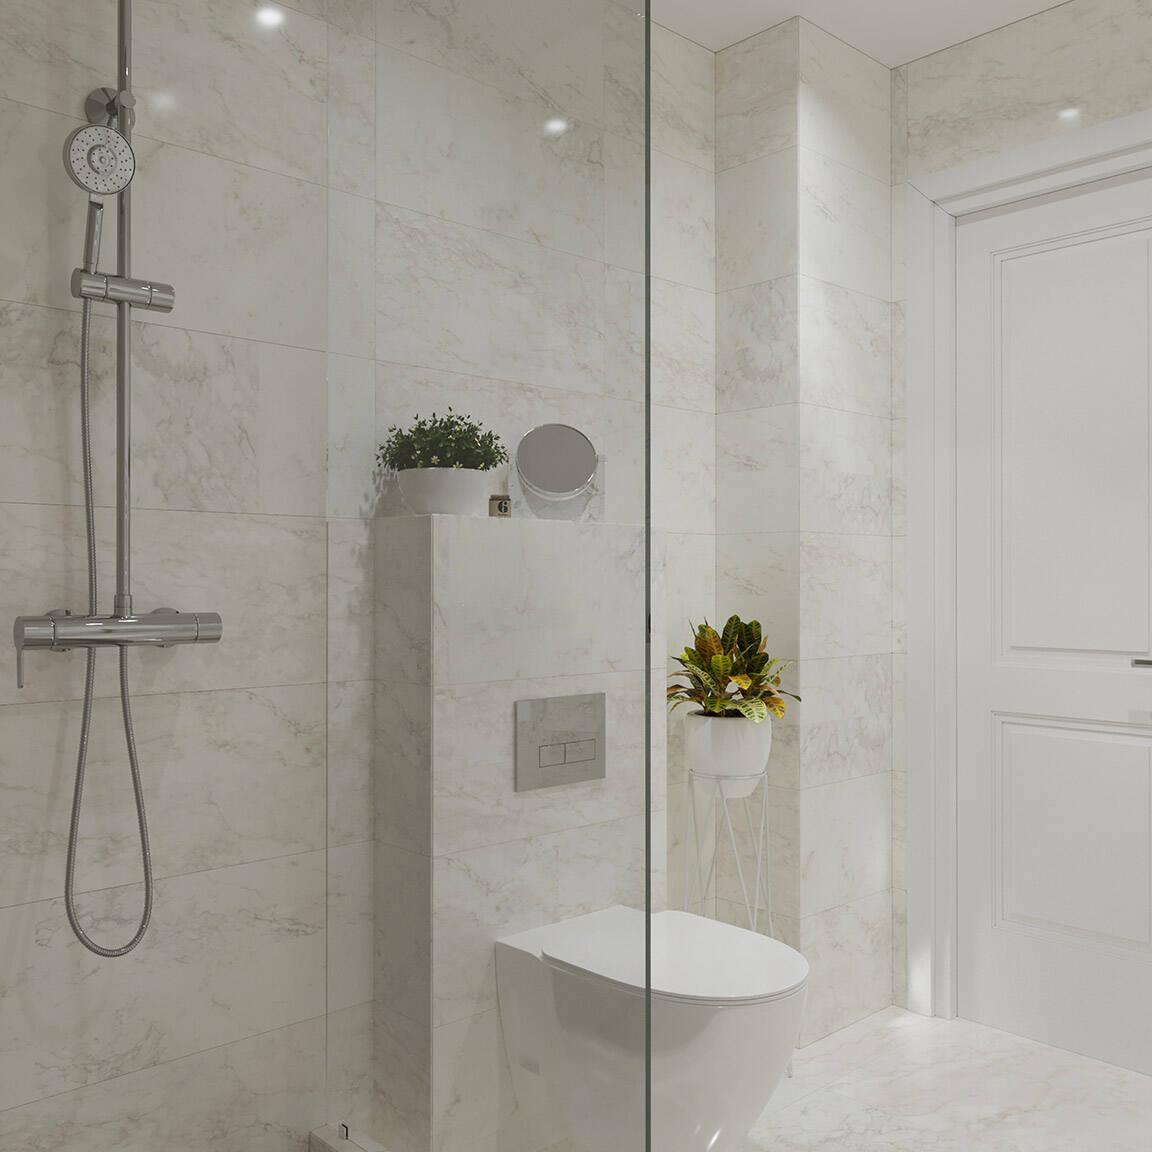 Catedral Residence - Bathroom - Marazzi Ceramic tiles - 12